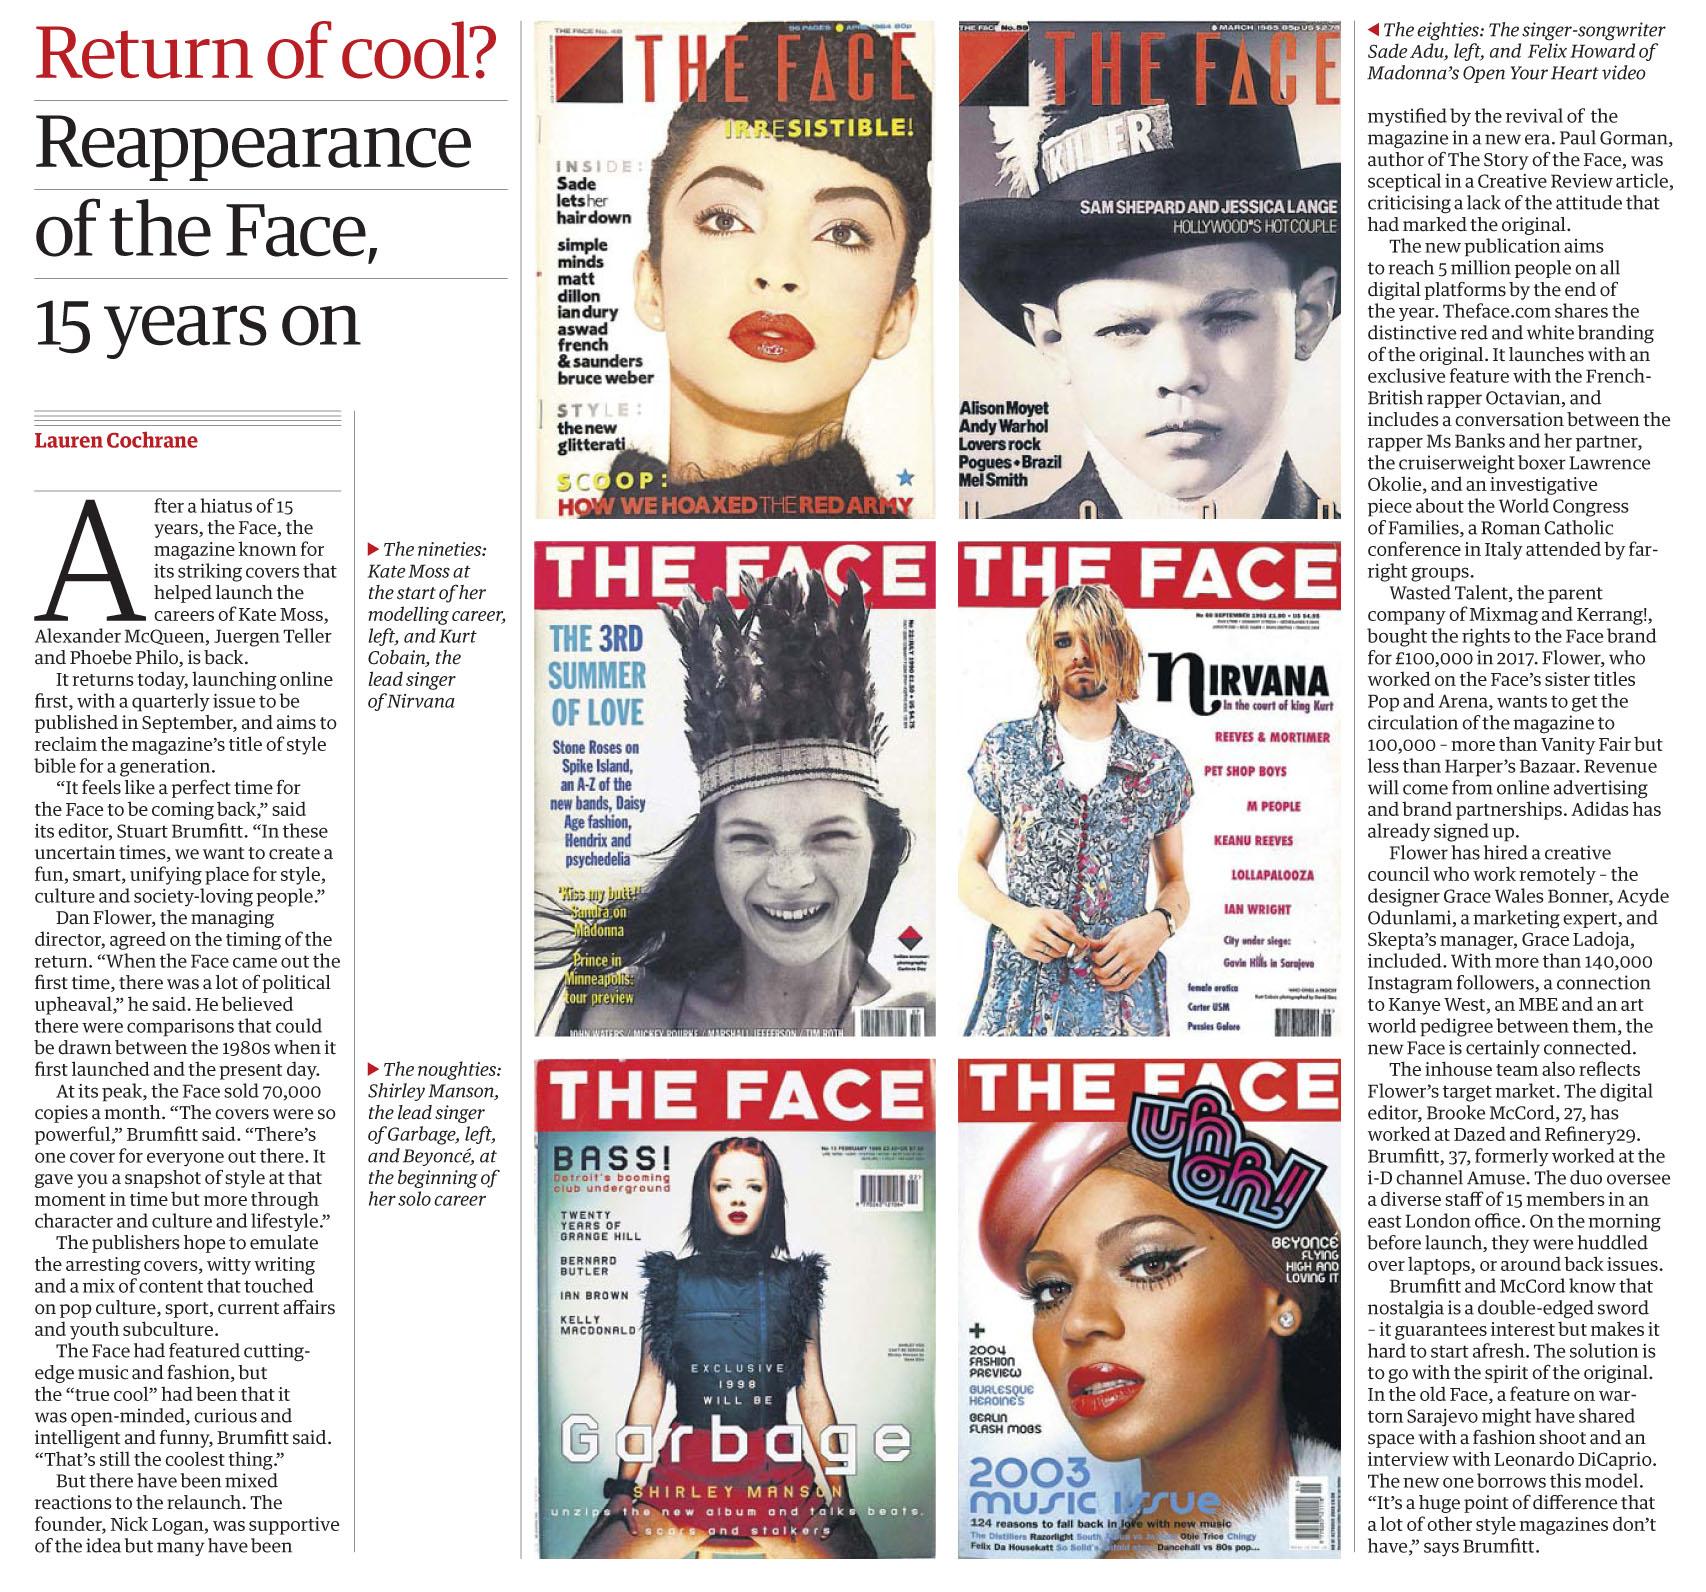 The Guardian April 17 2019 The Face.jpg